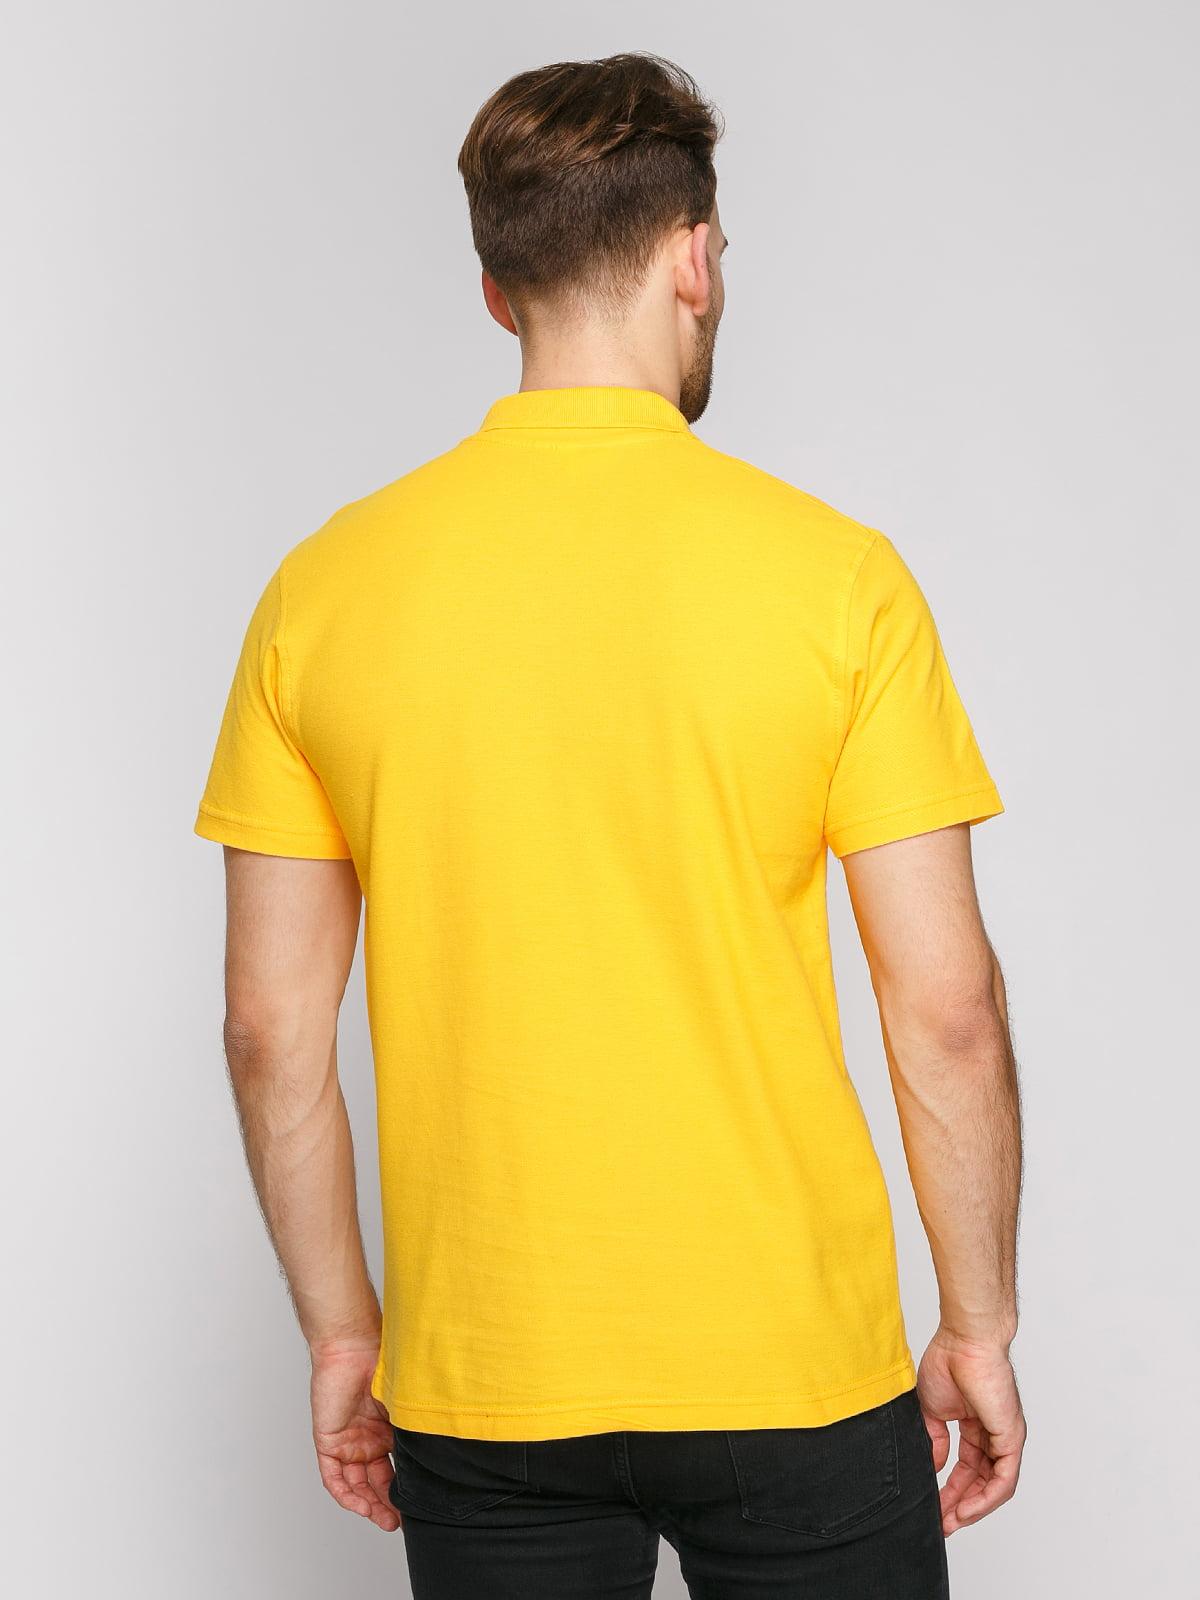 Футболка-поло жовта | 4812196 | фото 2